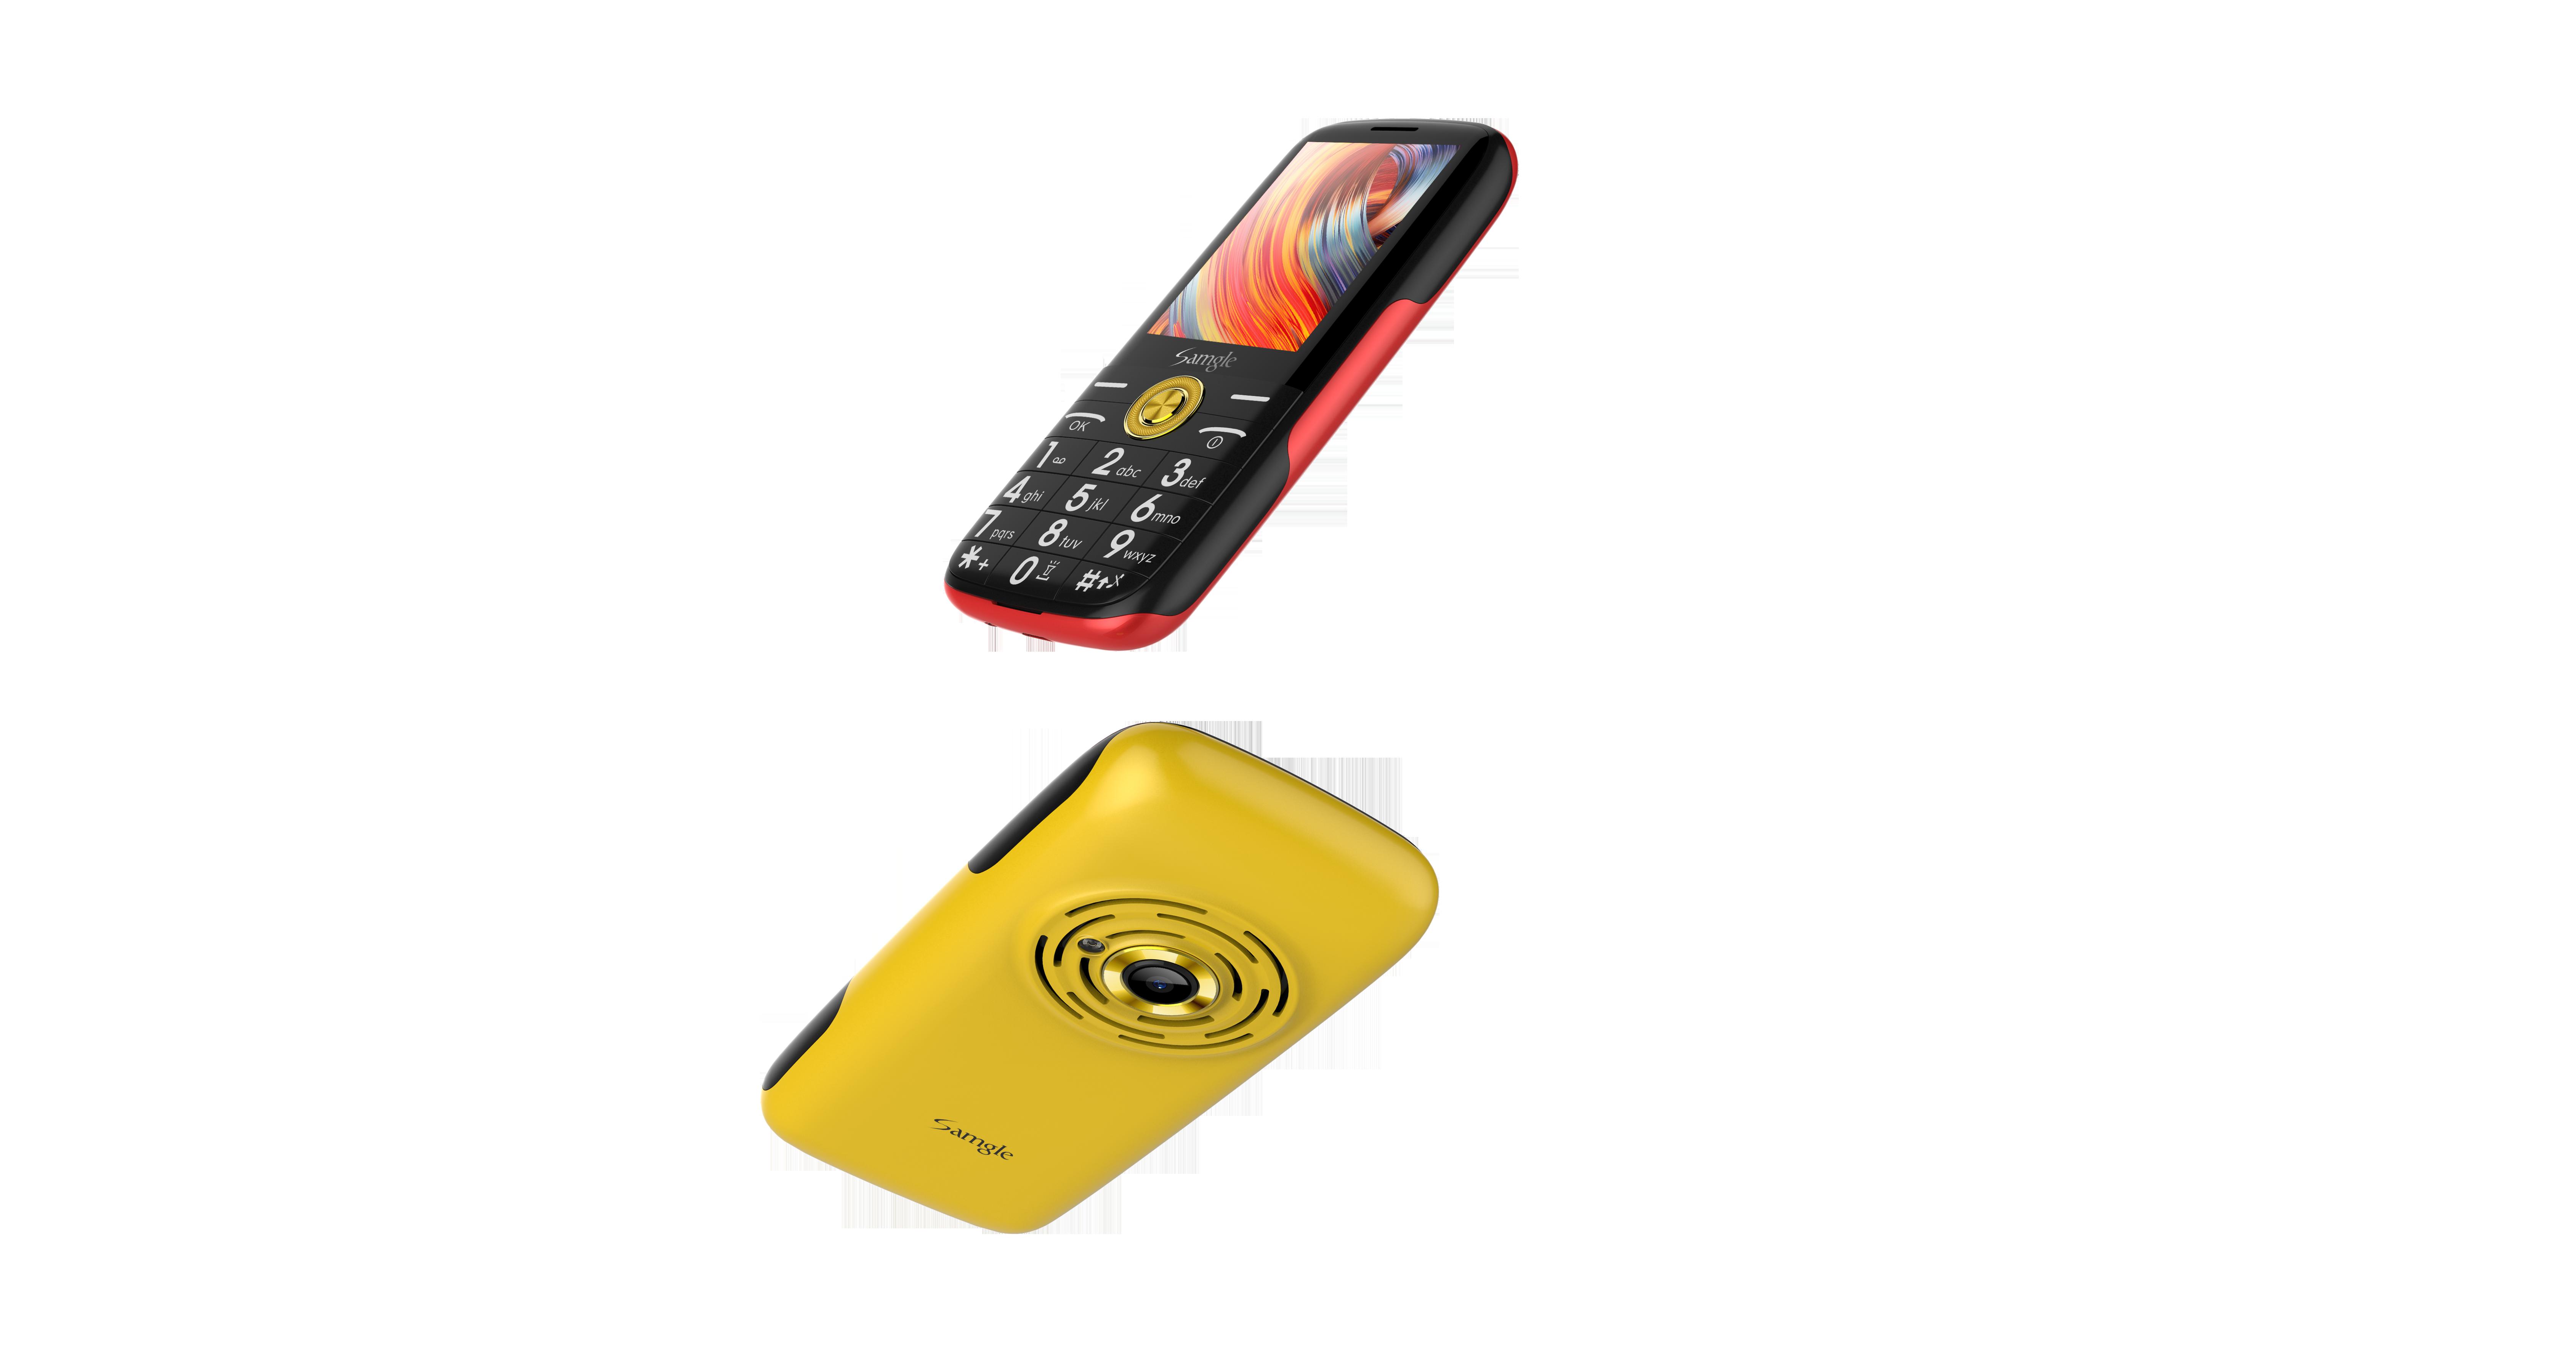 Telefon mobil Samgle Captain 3G, QVGA 2.4 inch, Bluetooth, Digi 3G, Camera, Slot Card, Radio FM, Internet, Dual SIM 18